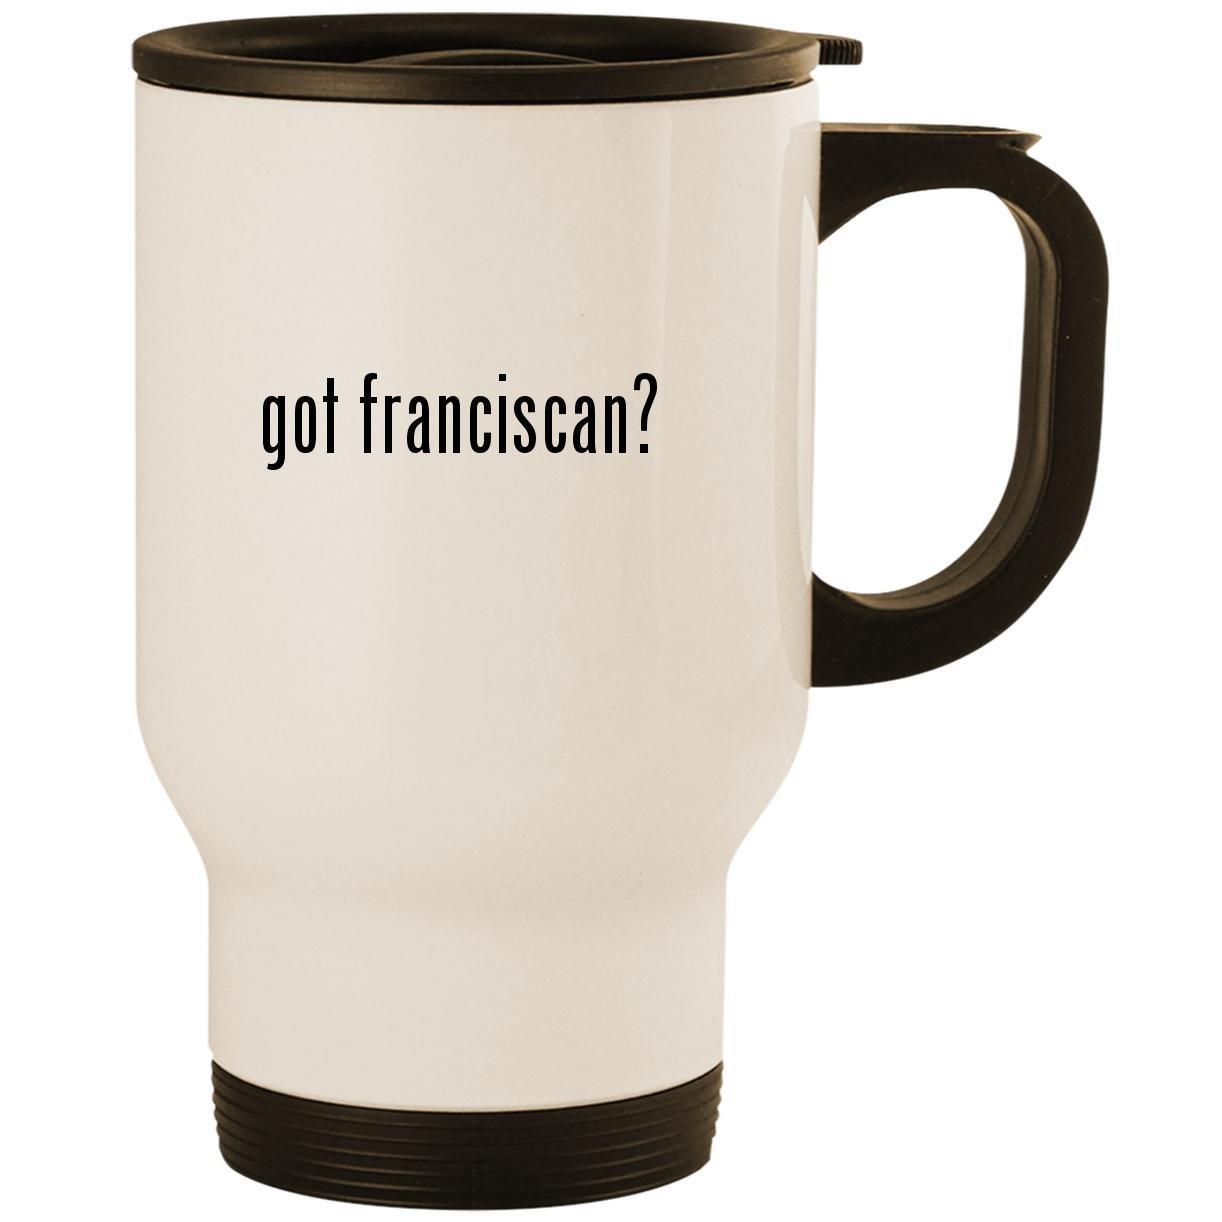 got franciscan? - Stainless Steel 14oz Road Ready Travel Mug, White